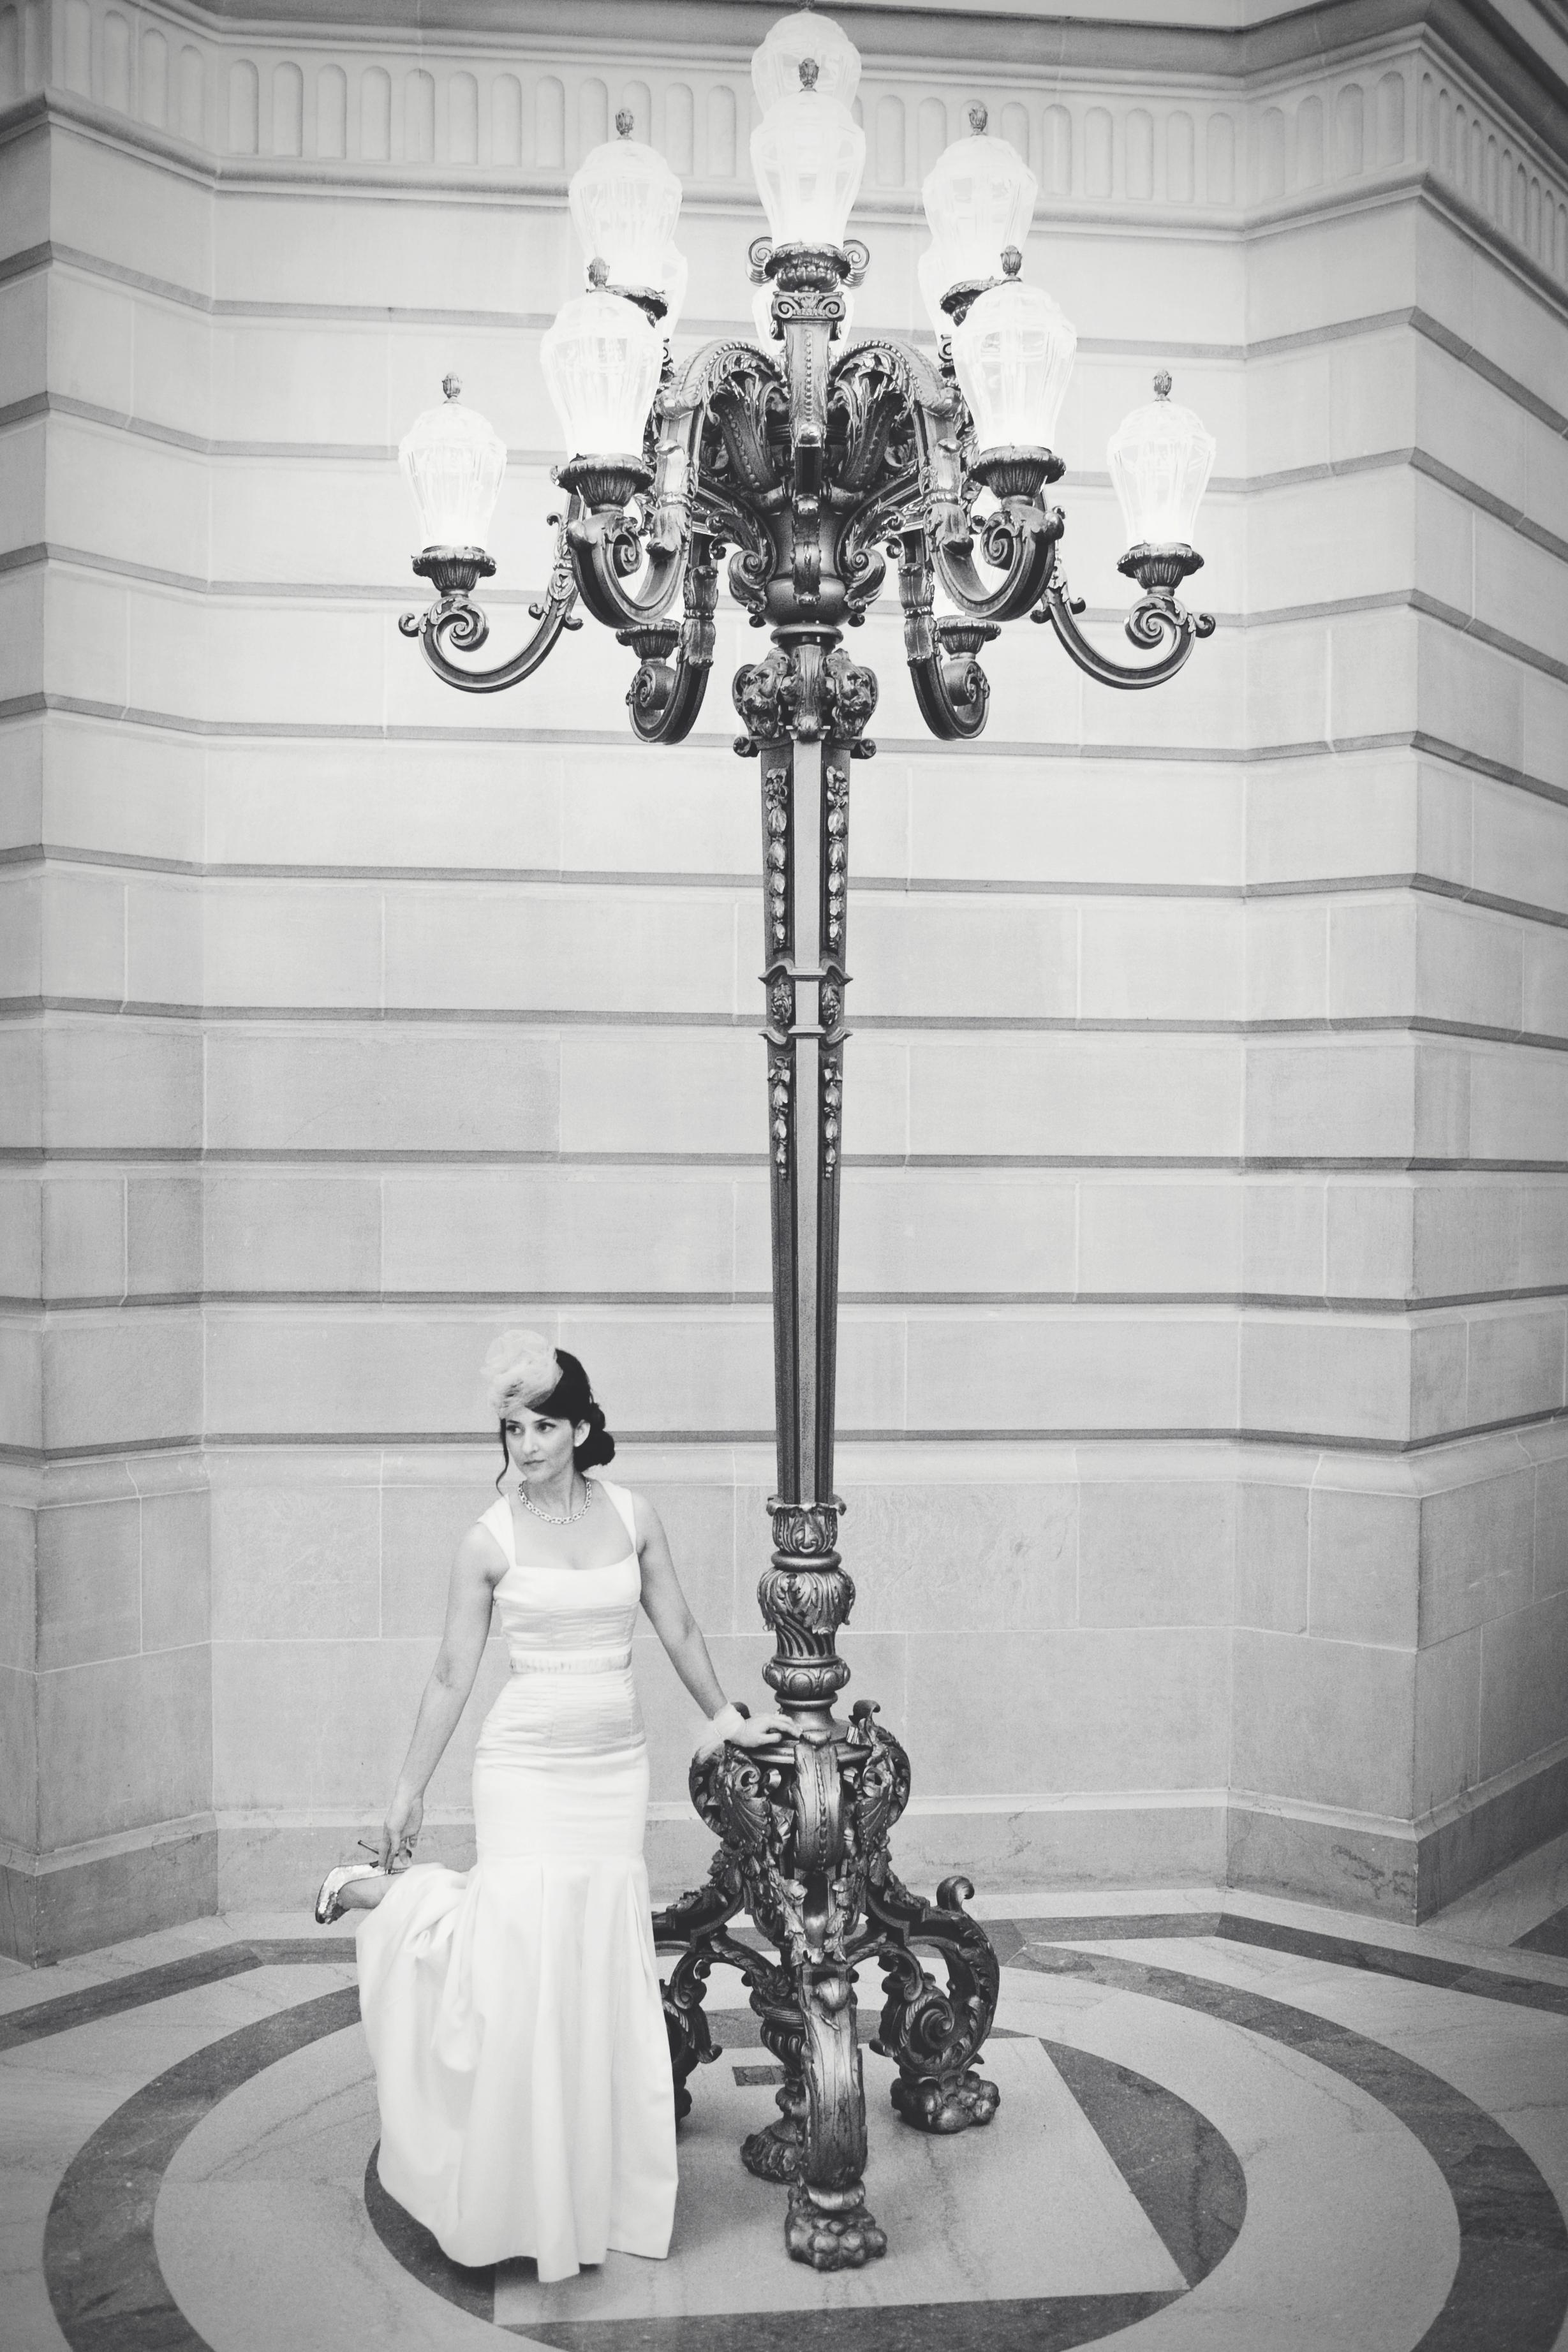 San_Francisco_City_Hall_Wedding_Photography_Cori_EB-15.JPG